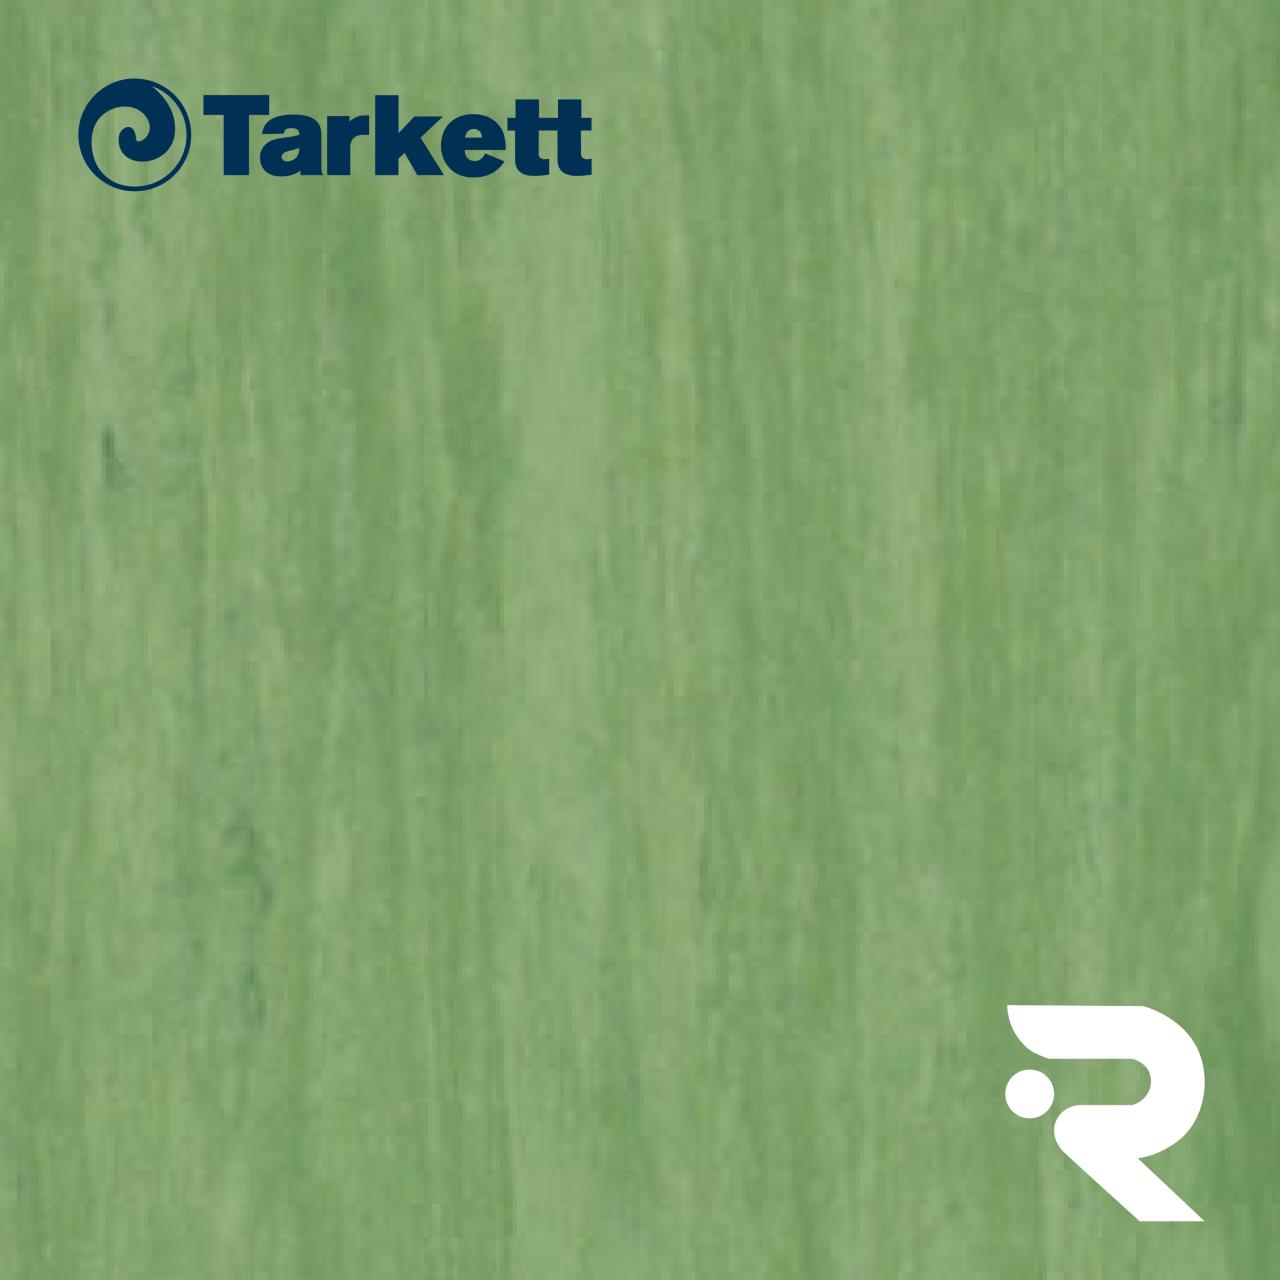 🏫 Гомогенный линолеум Tarkett   Standard DARK GREEN 0921   Standard Plus 2.0 mm   2 х 23 м